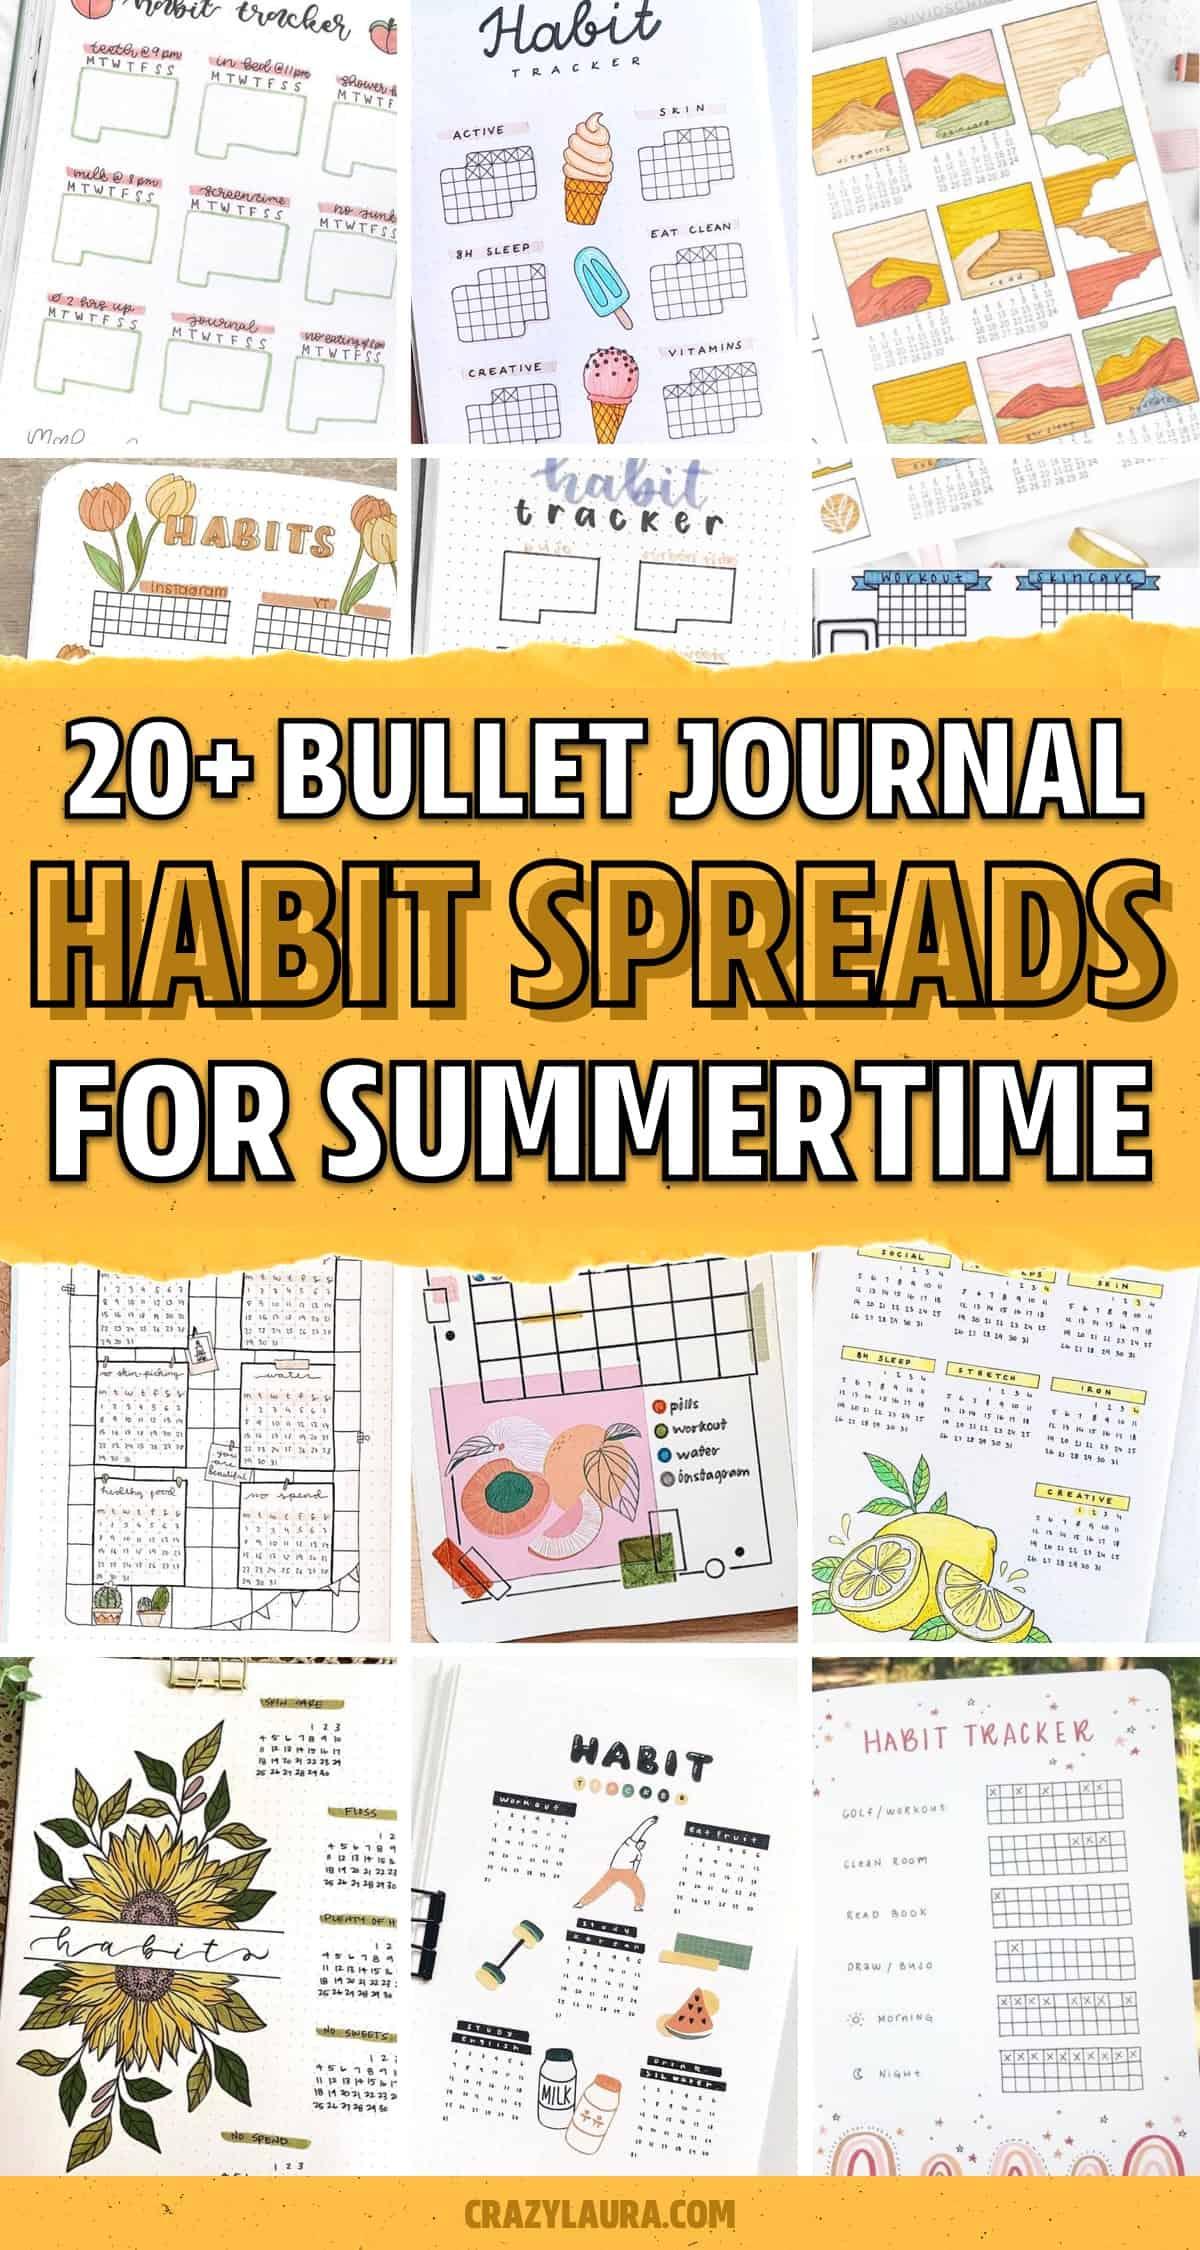 habit tracker layout inspiration for summer